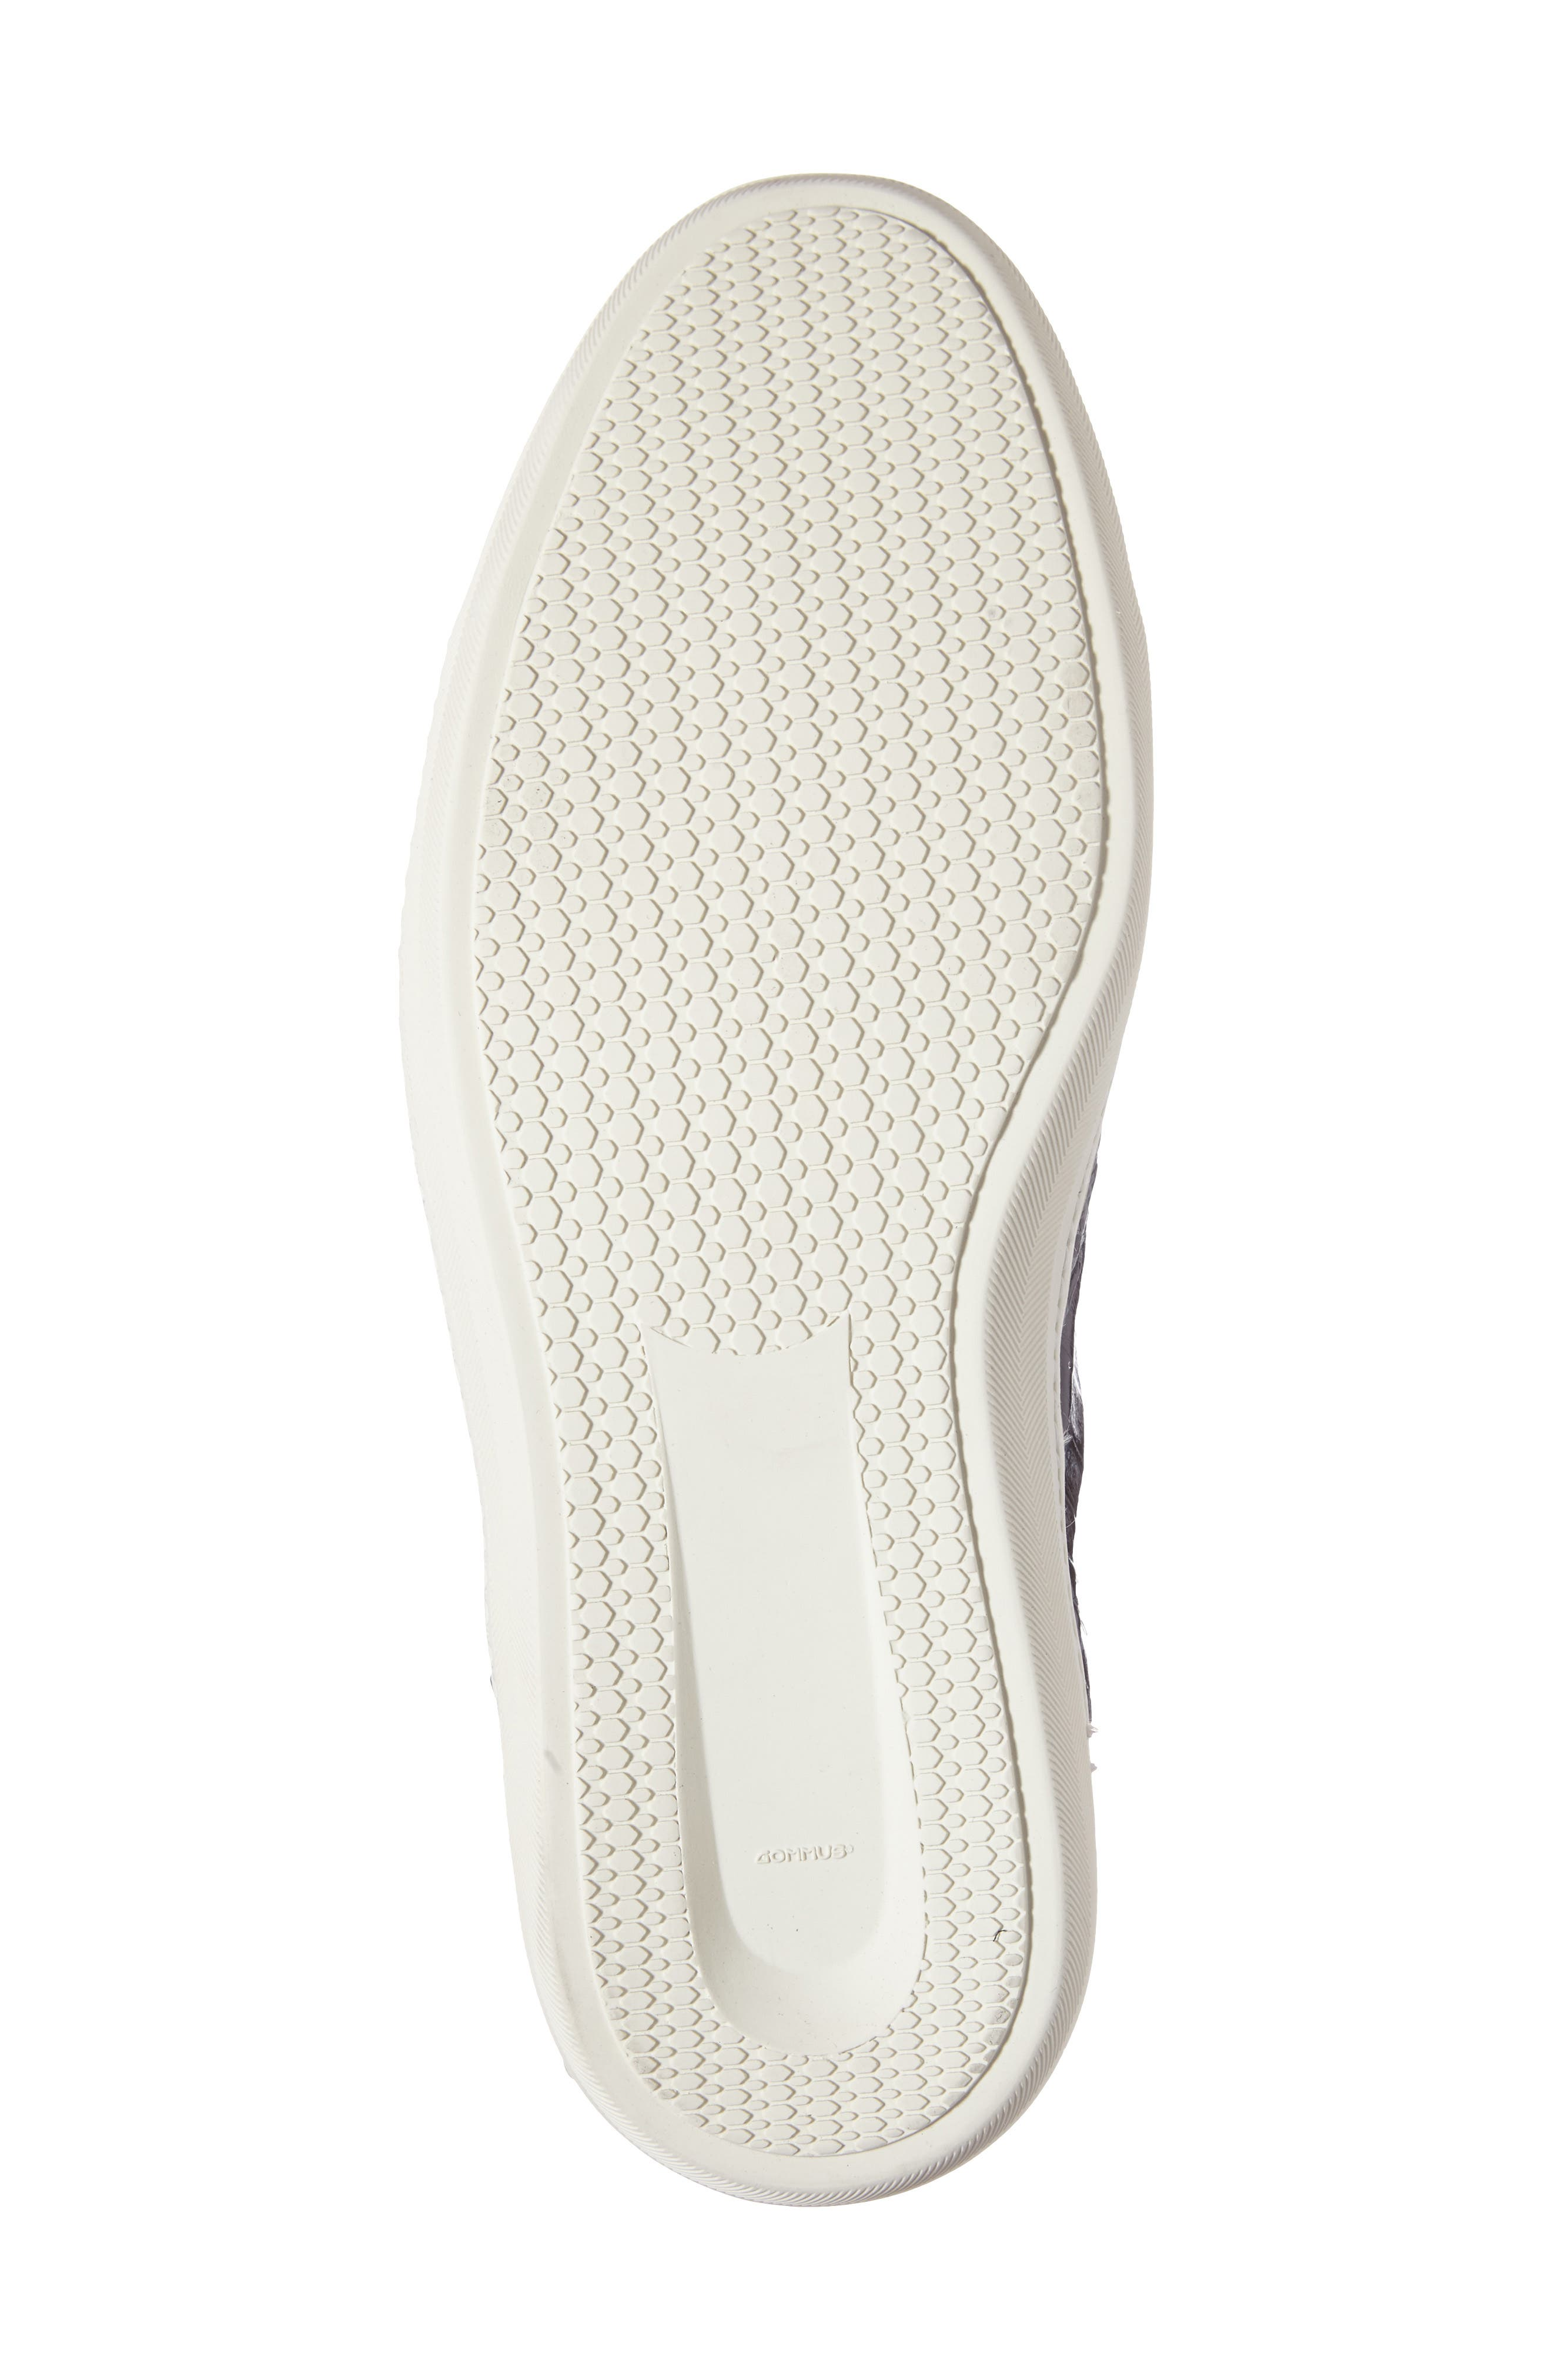 Hickman Genuine Crocodile Sneaker,                             Alternate thumbnail 4, color,                             020